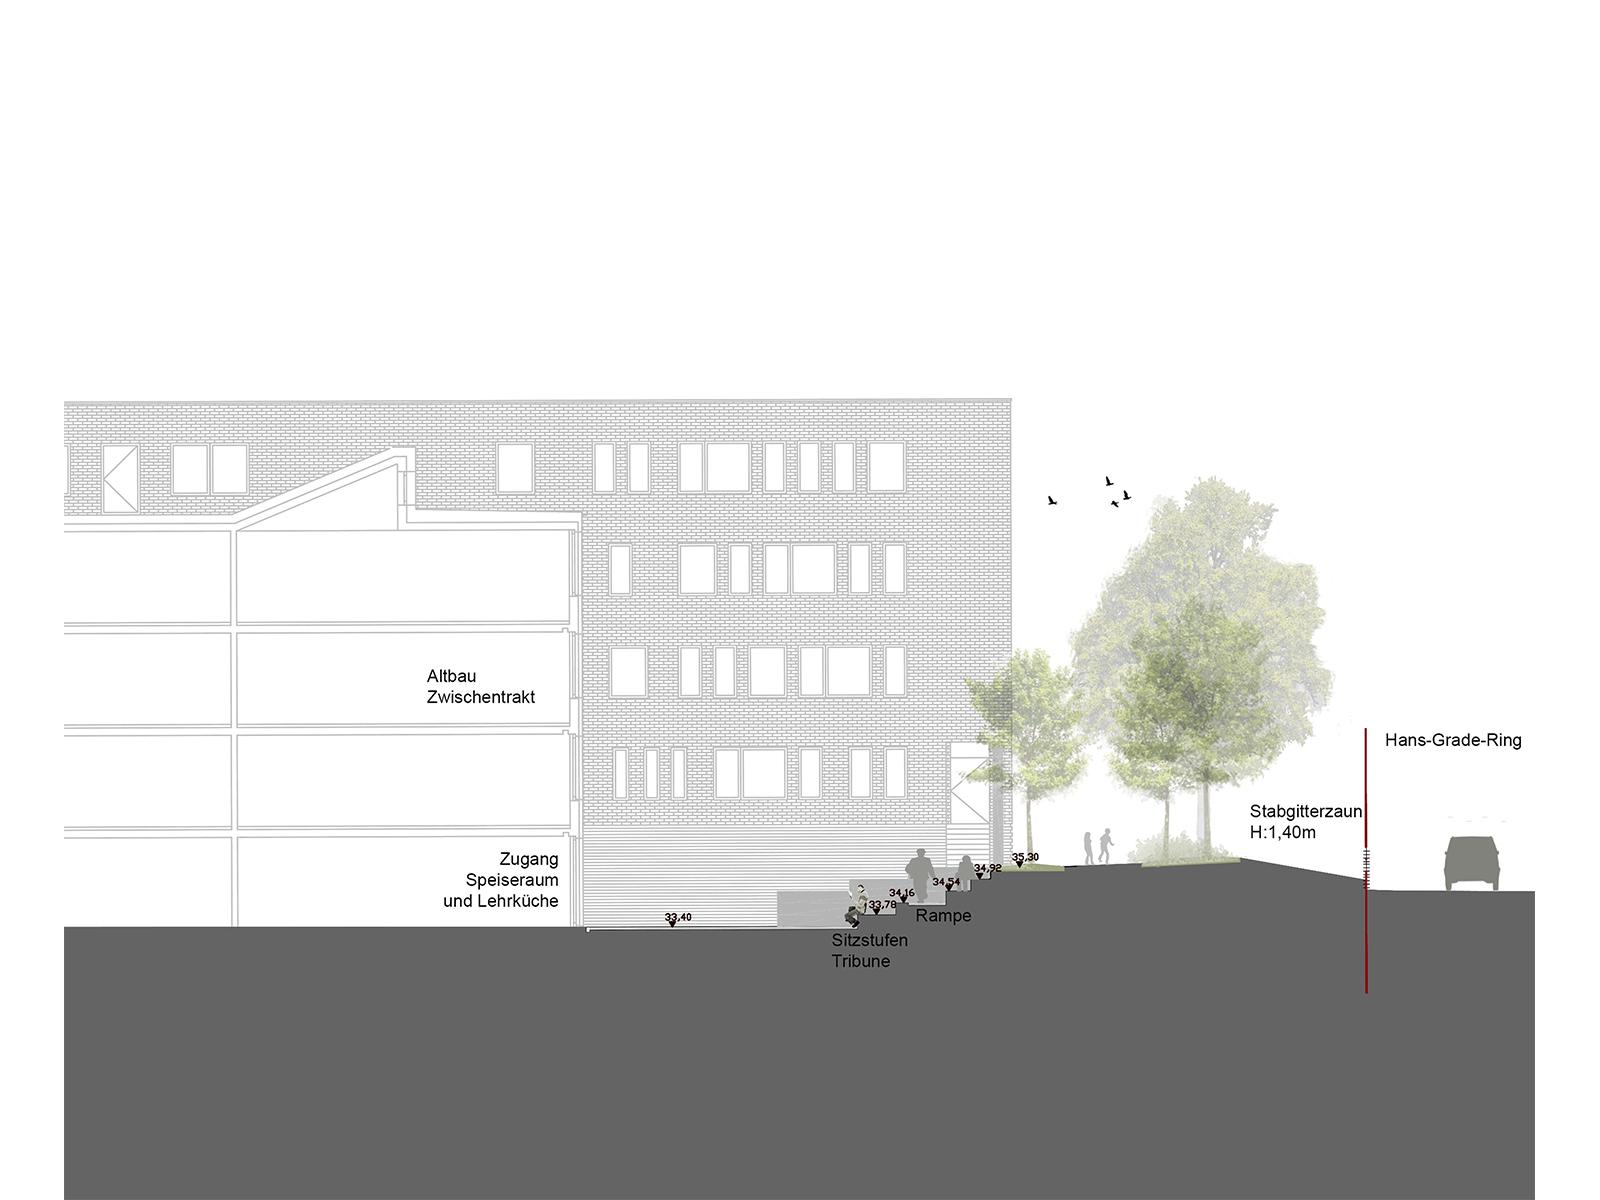 Schnitte-Rampe-Sitzstufen-Tribune-Pausenhof-Berin-Landschaftarchitekten